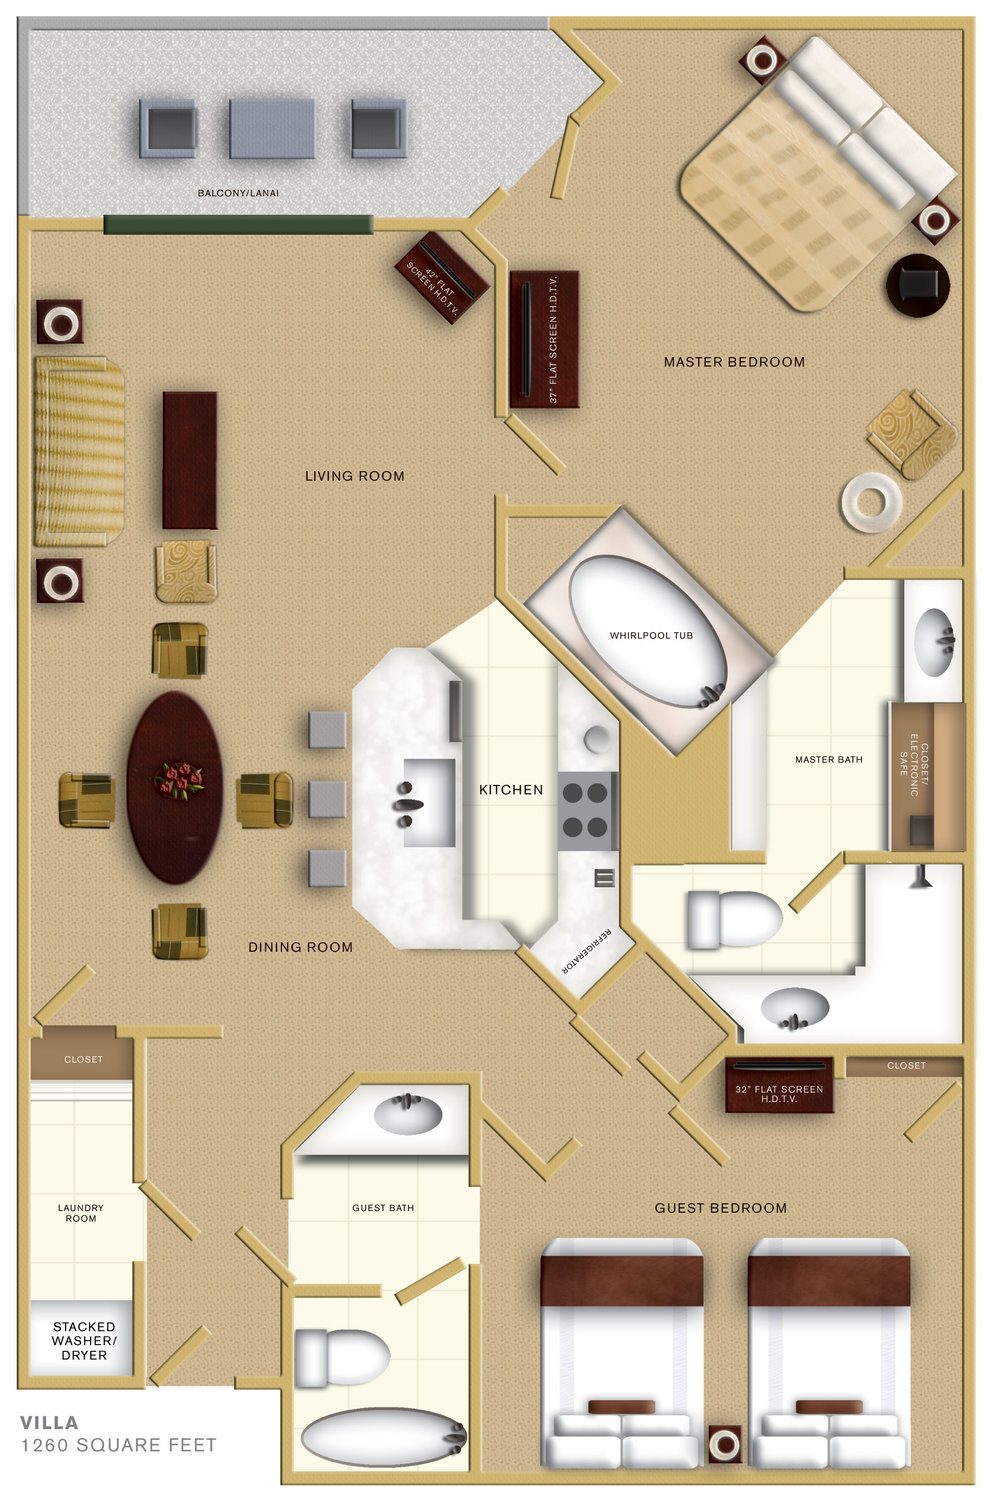 10C - Villas - Diagram .jpg